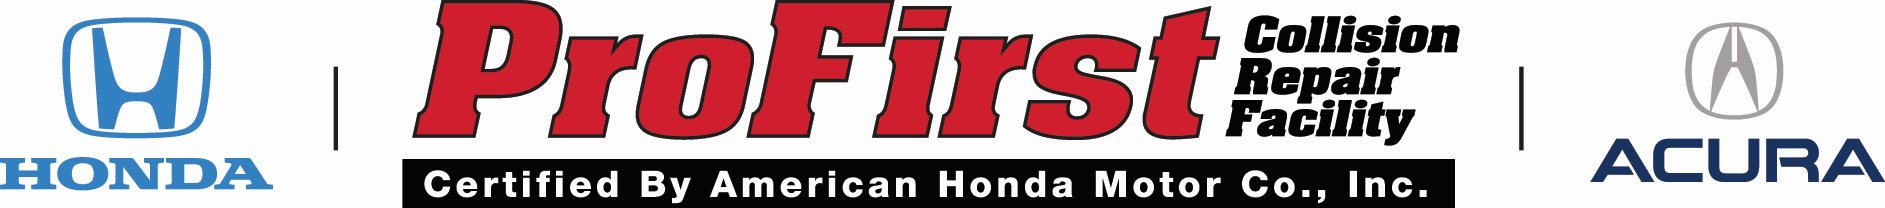 Honda & Acura Profirst Colission Repair Facility